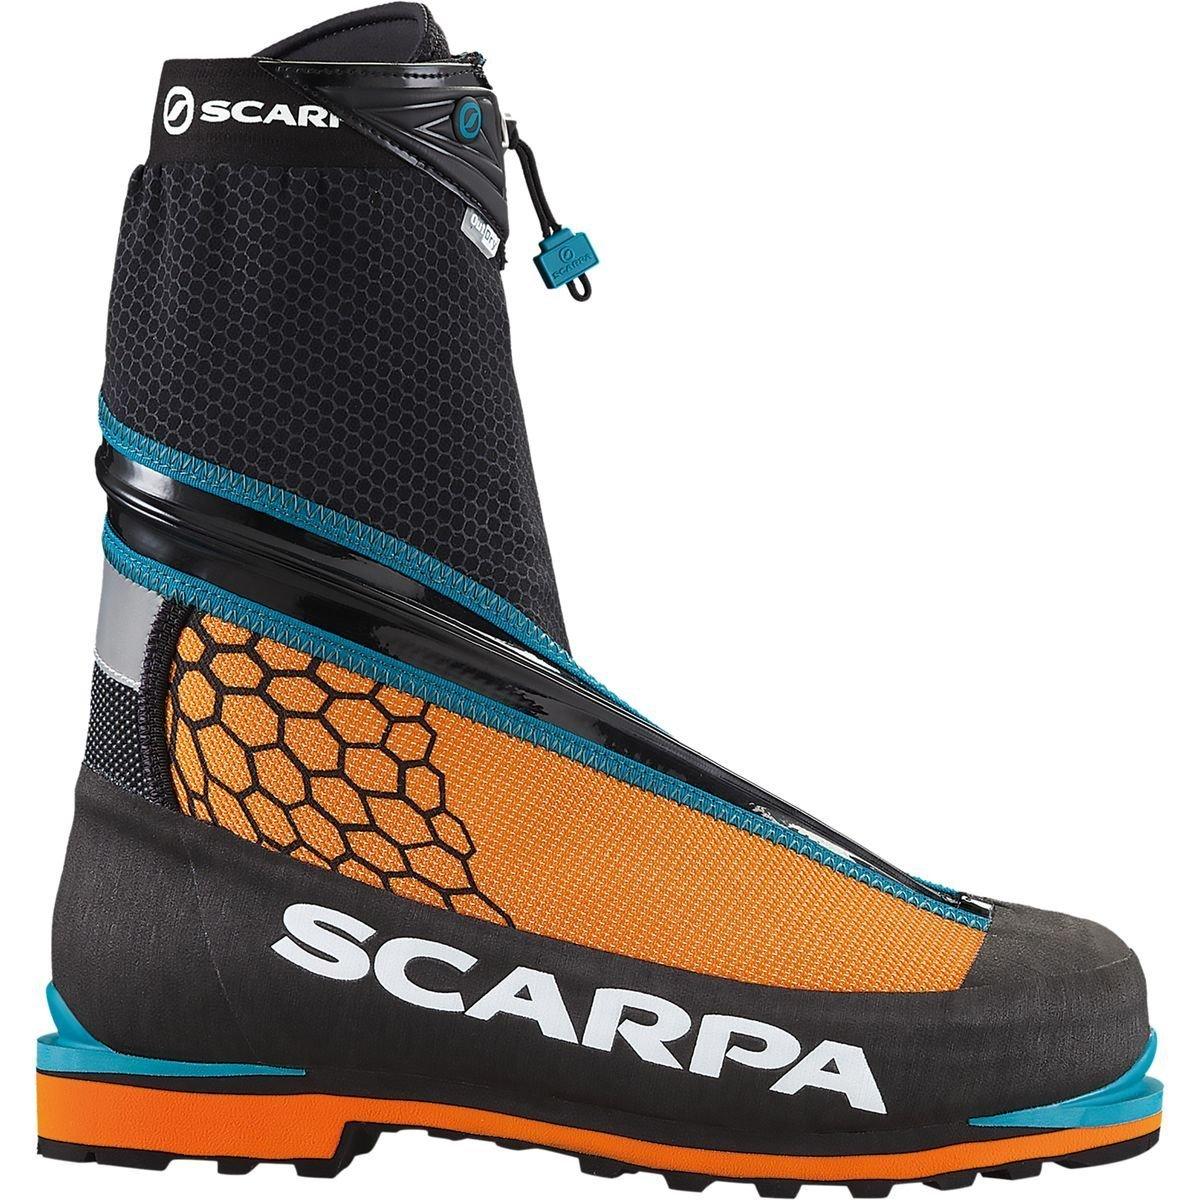 SCARPA Phantom Tech Mountaineering Boot, Black/Orange, 43 EU/10 M US